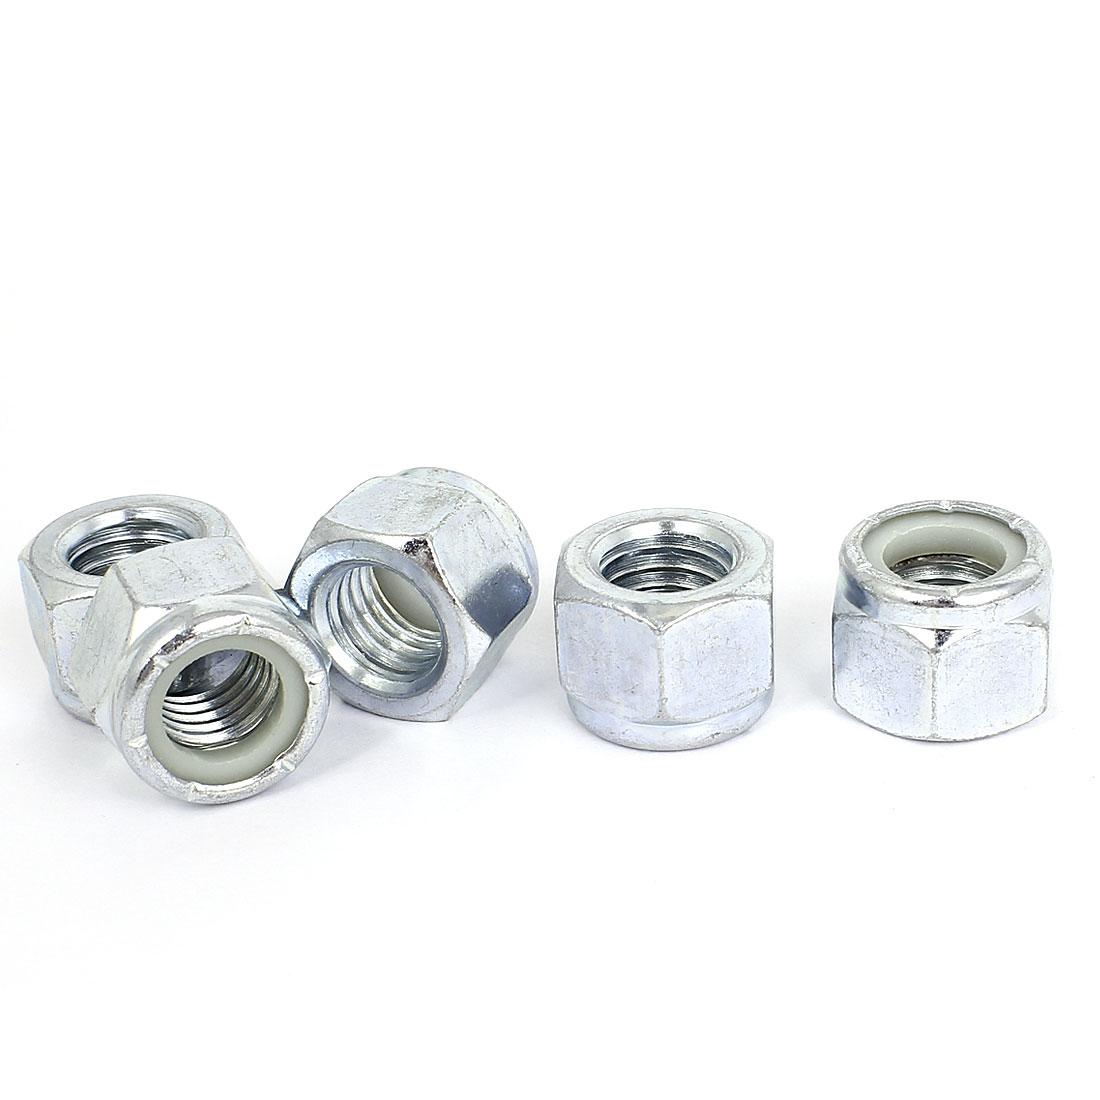 "5pcs Zinc Plated Nylock Self-Locking Nylon Insert Hex Lock Nuts 5/8""-11"